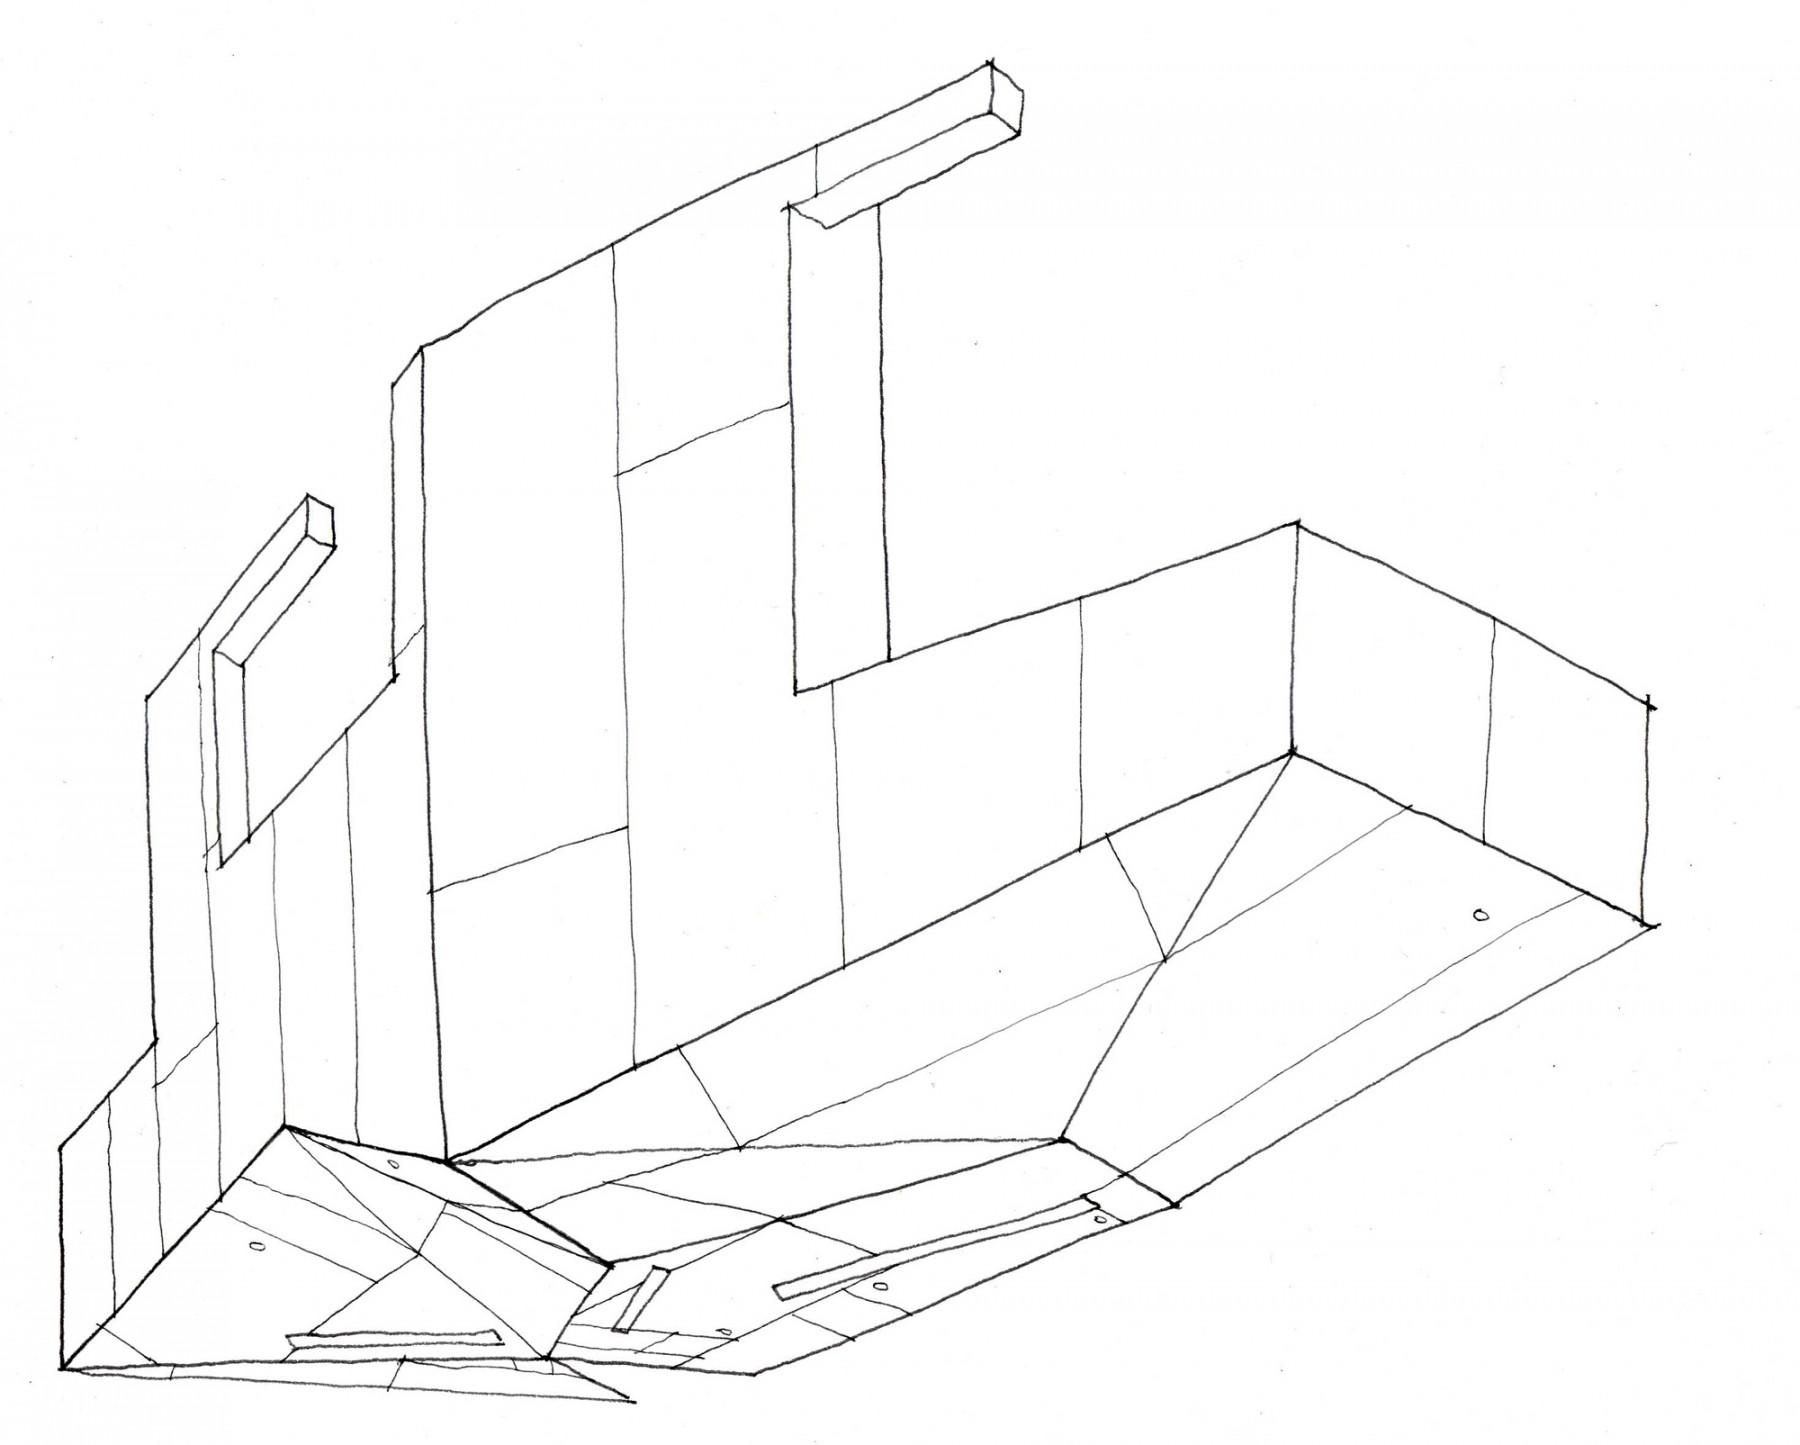 Konditor-&-Cook-cake-shop-cafe-retail-London-Jamie-Fobert-Architects-steel-30-St-Mary-Axe-gherkin-sketch